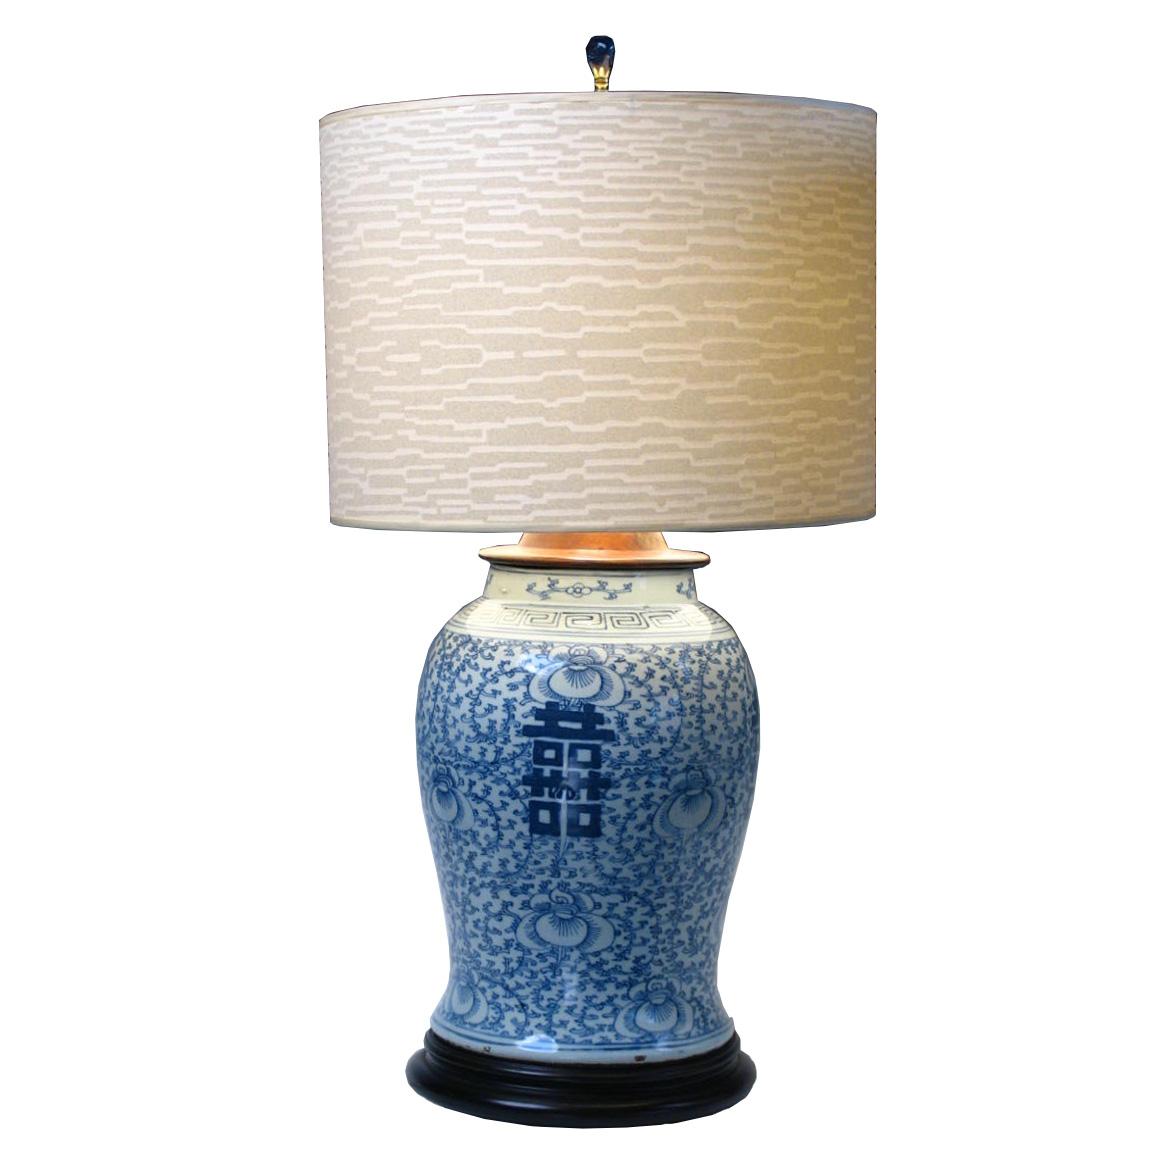 UH70003: Blue & White Lamp